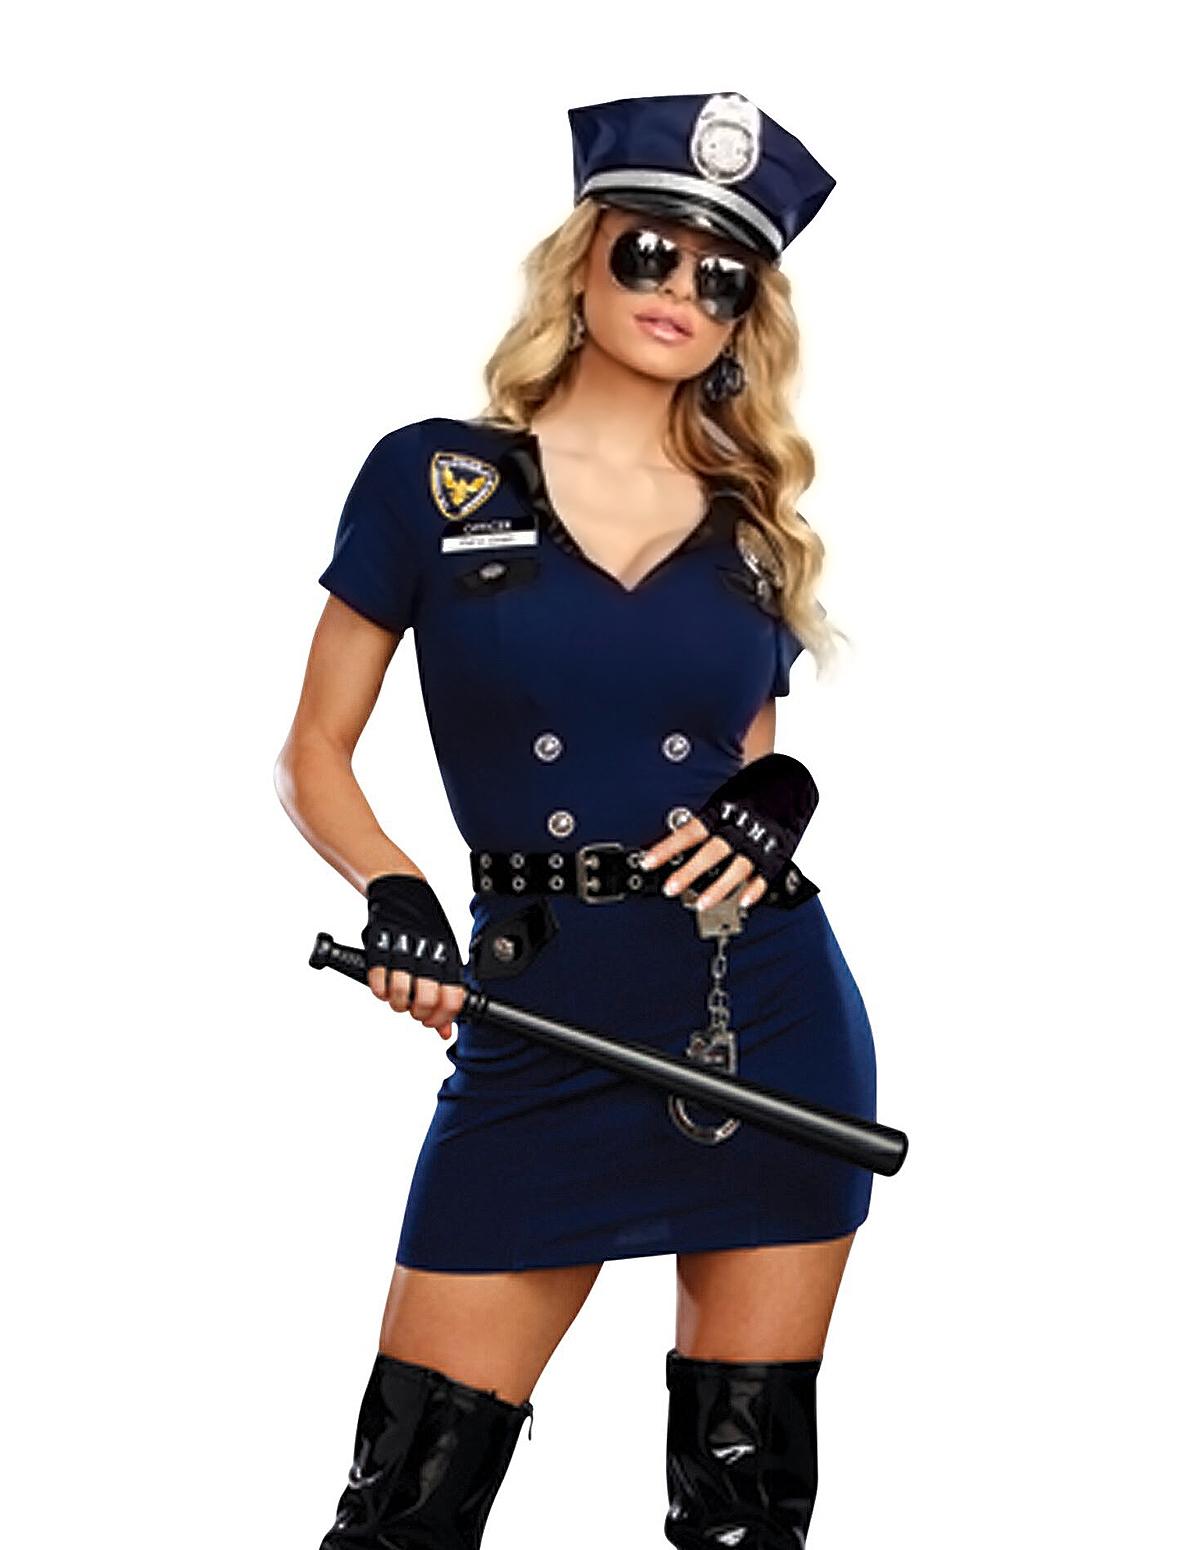 Officer Pat U Down